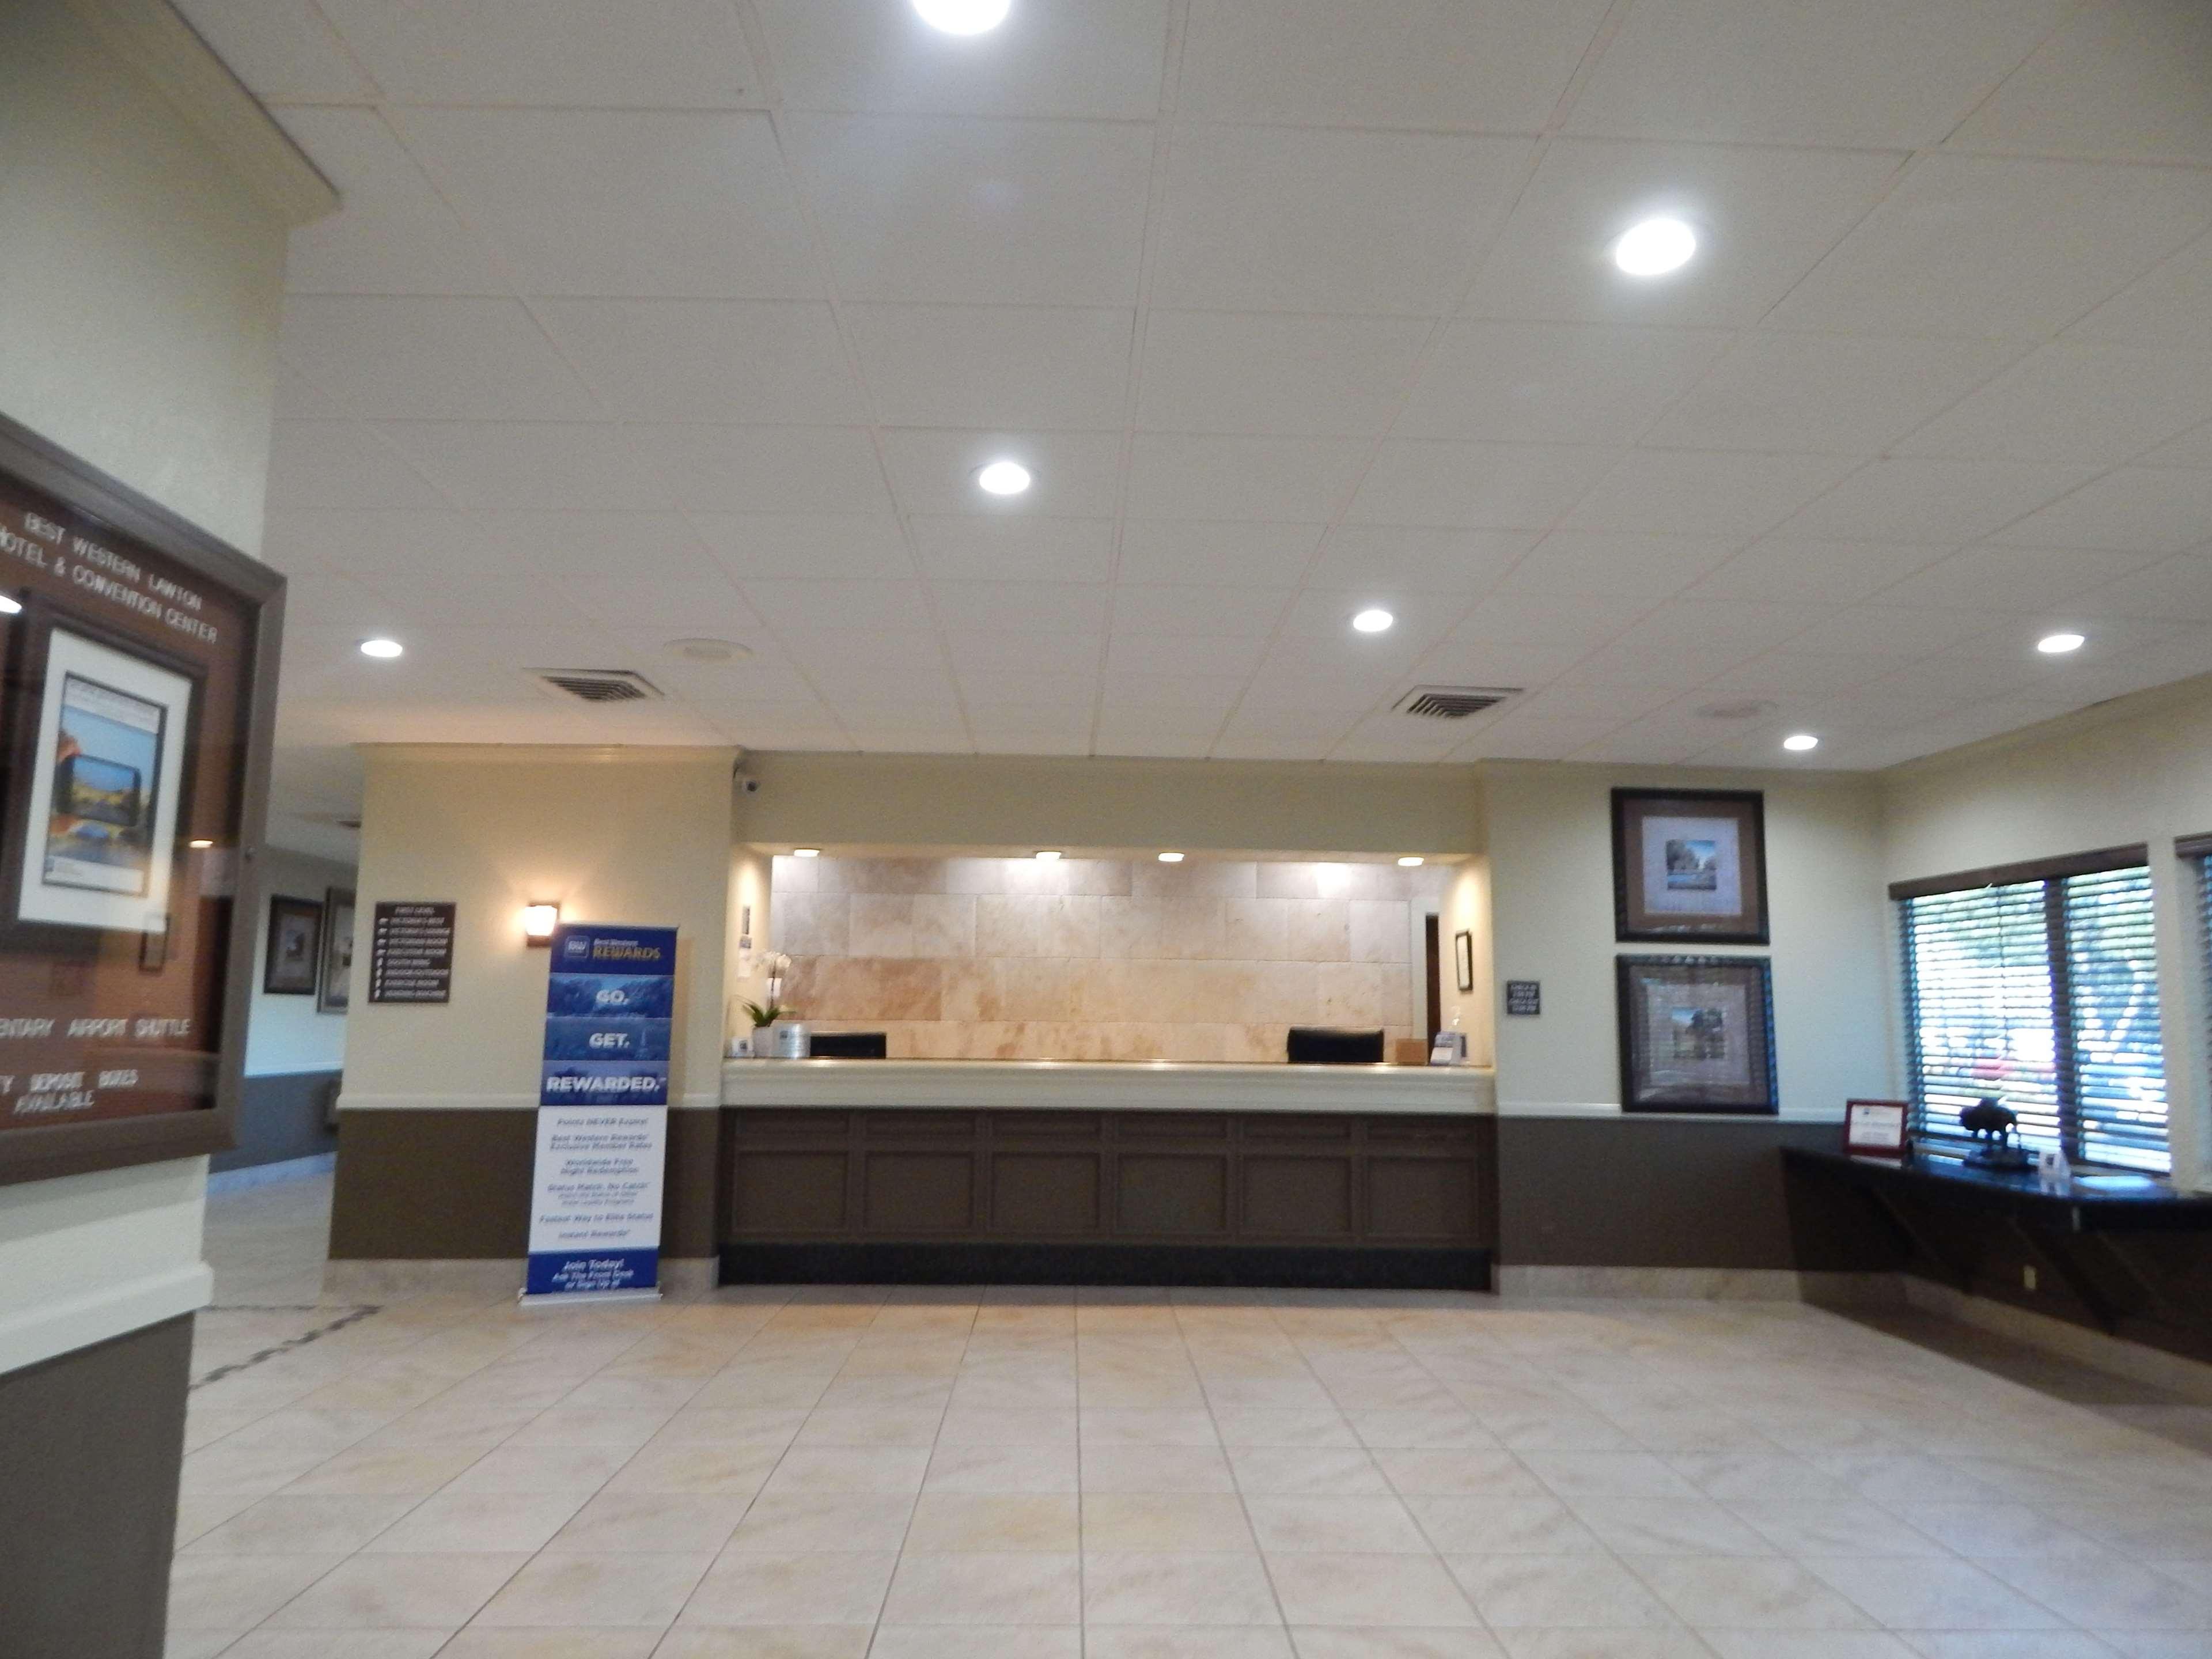 Best Western Plus Lawton Hotel & Convention Center image 48